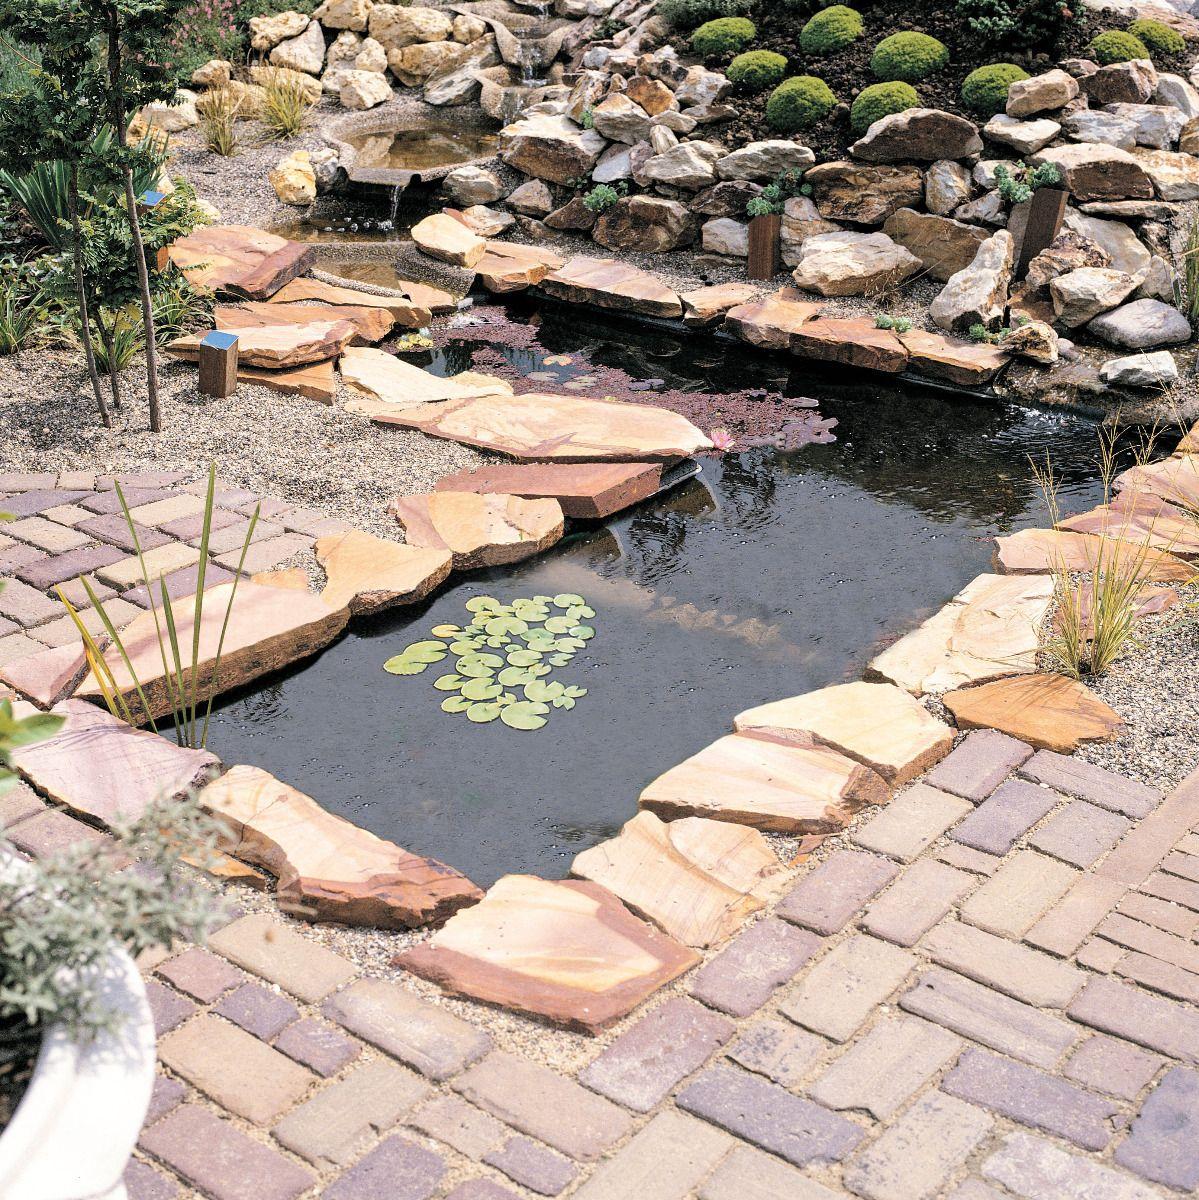 Comment Installer Un Bassin De Jardin Préformé ? tout Bassin Jardin Préformé